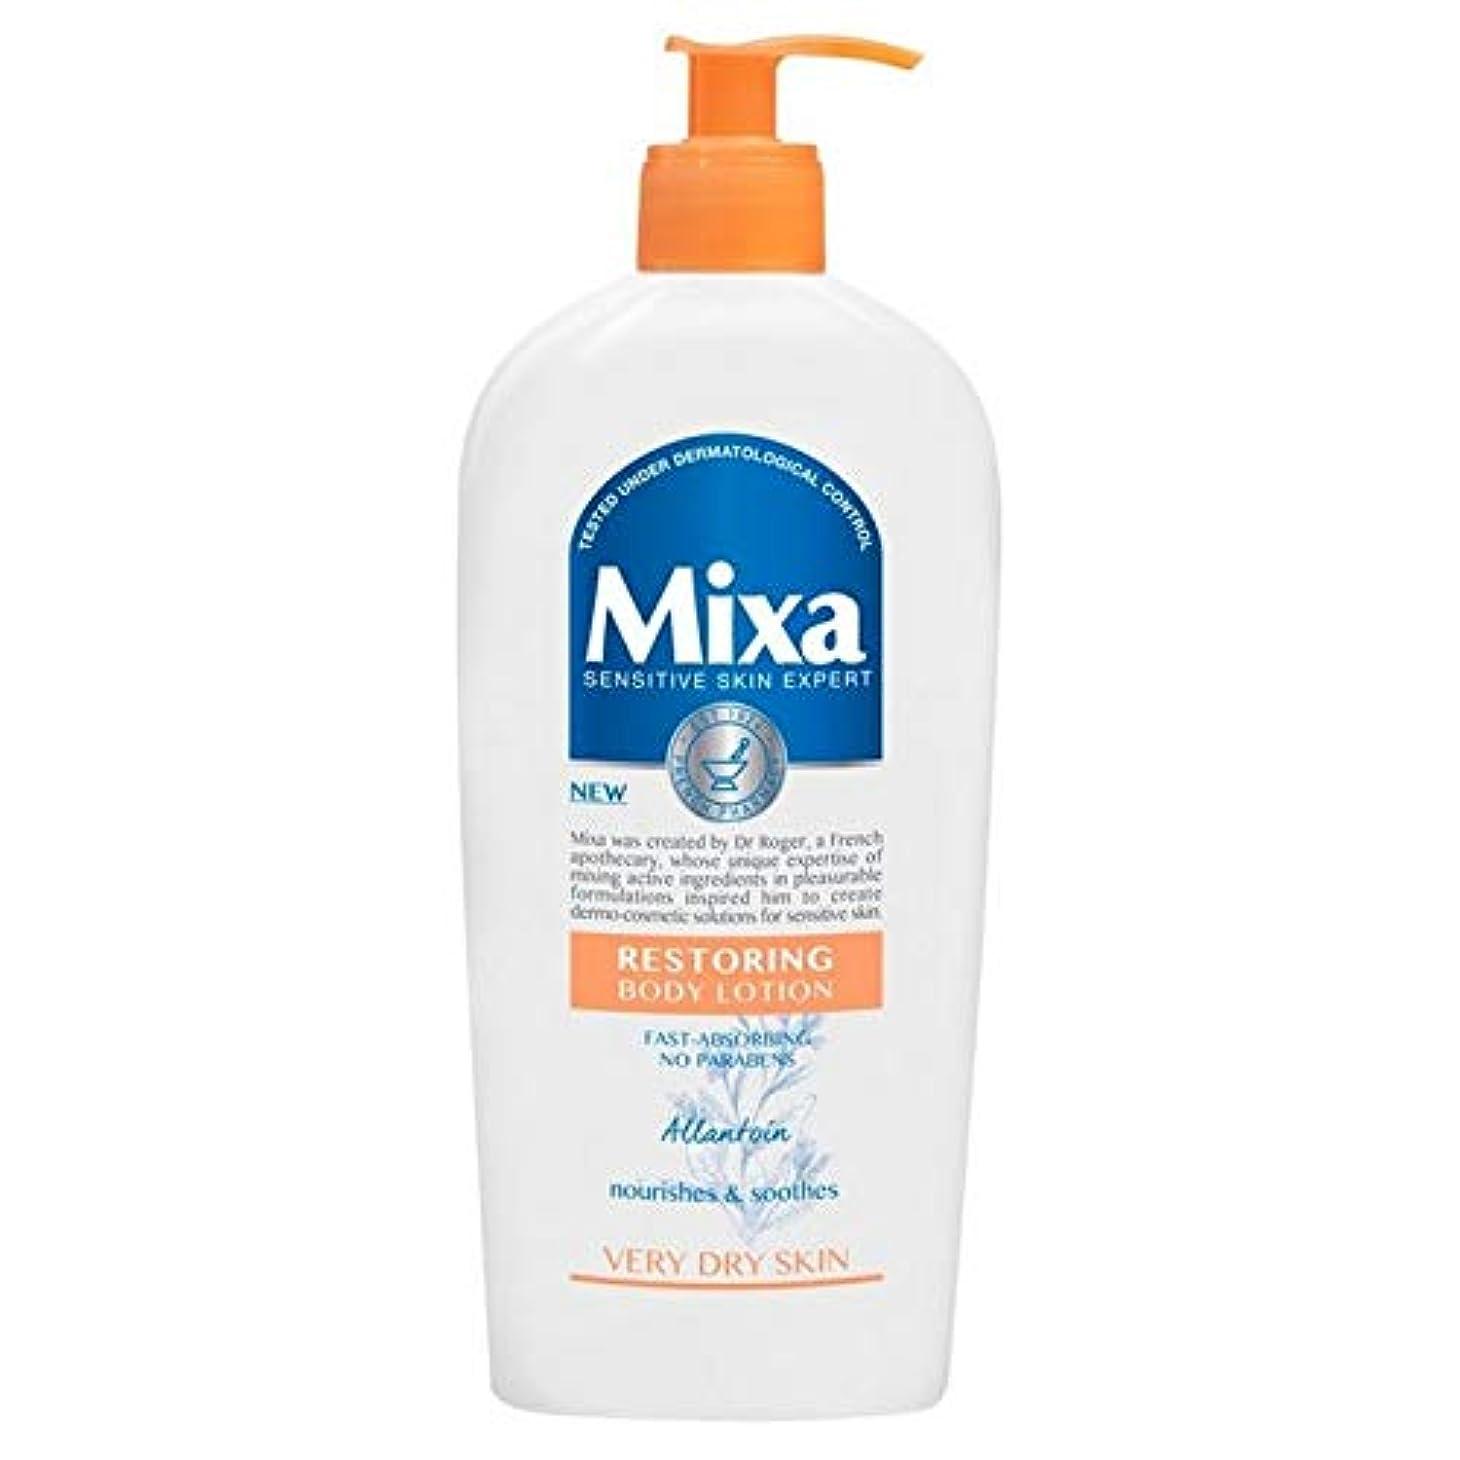 [Mixa] Mixa復元修理ボディローション400ミリリットル - Mixa Restoring Repair Body Lotion 400ml [並行輸入品]